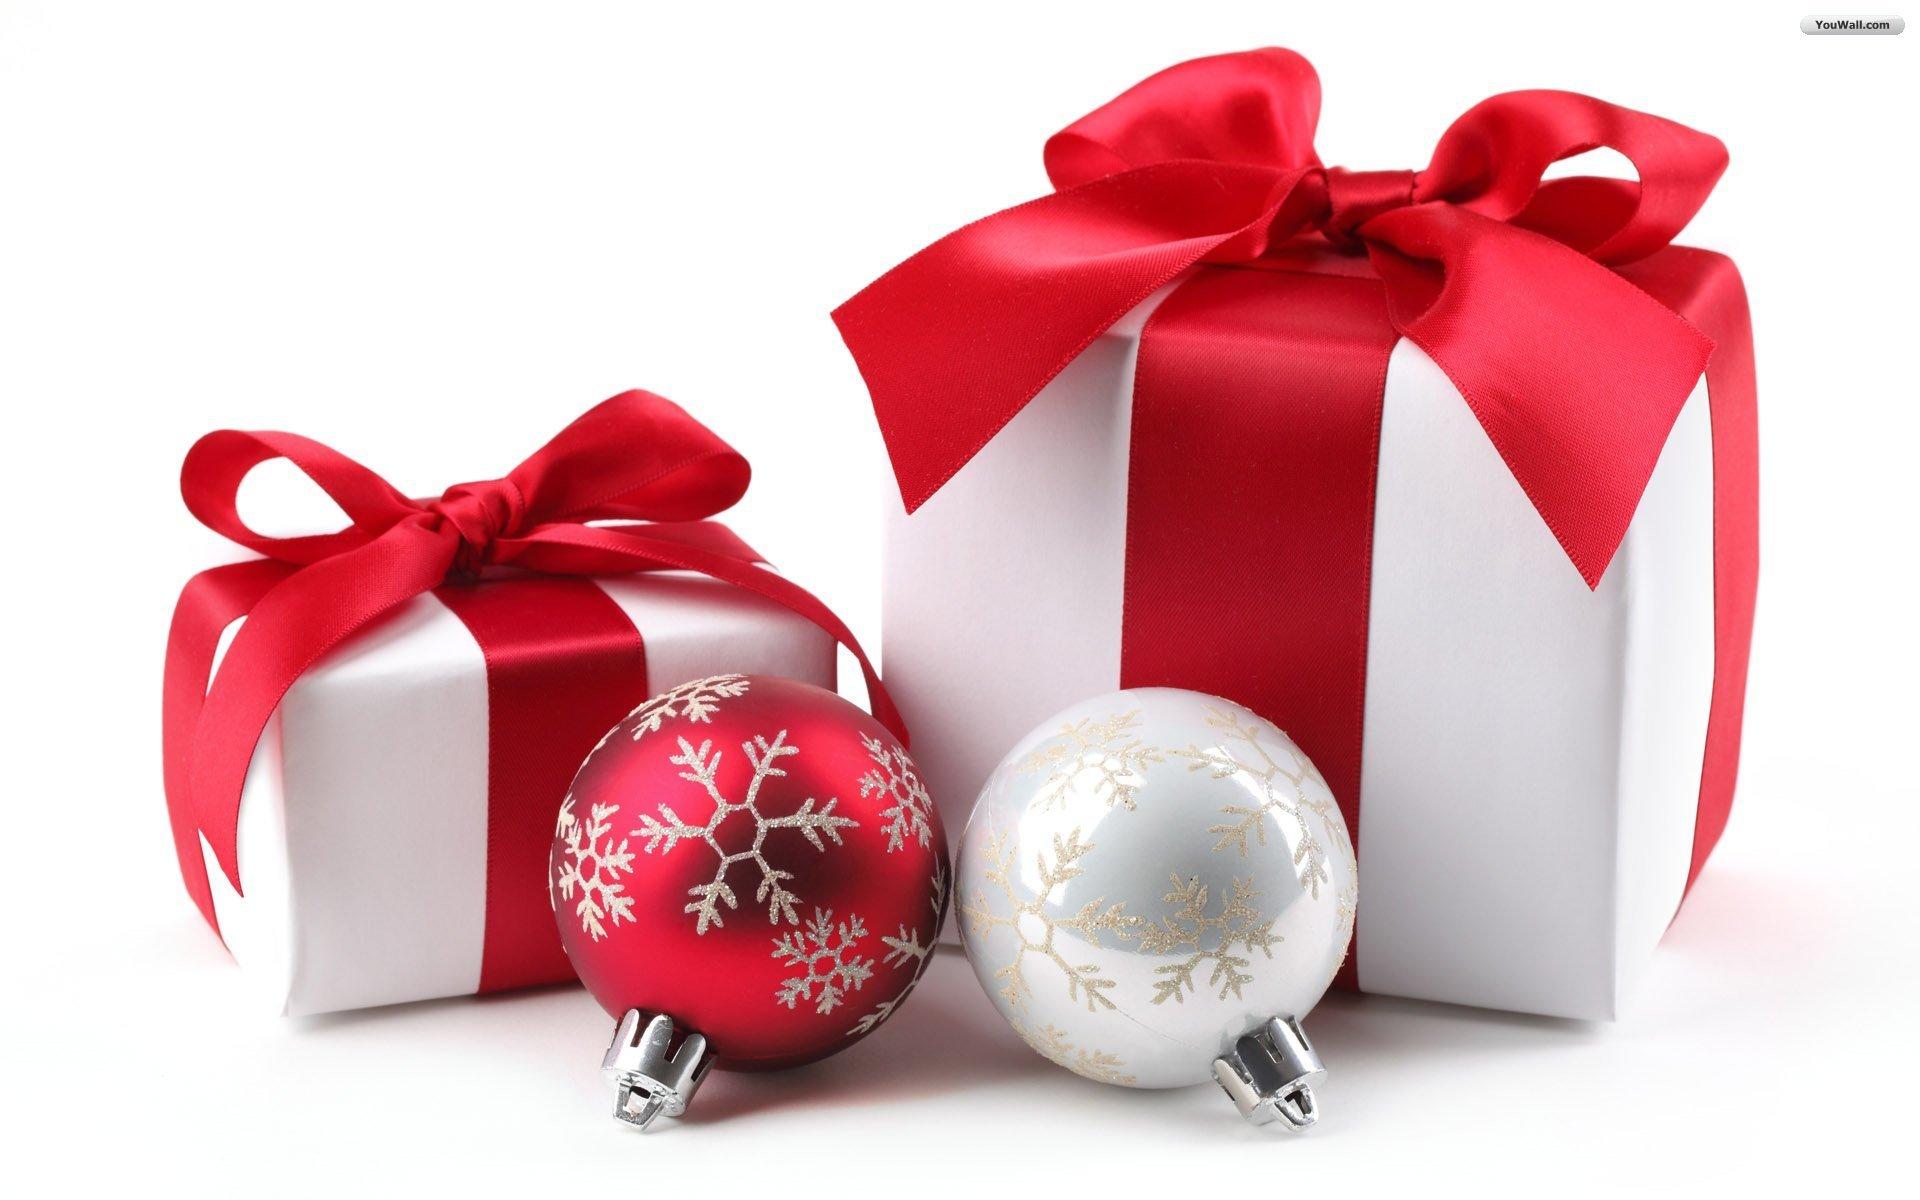 Gift Certicates Winter-Gift Certificates